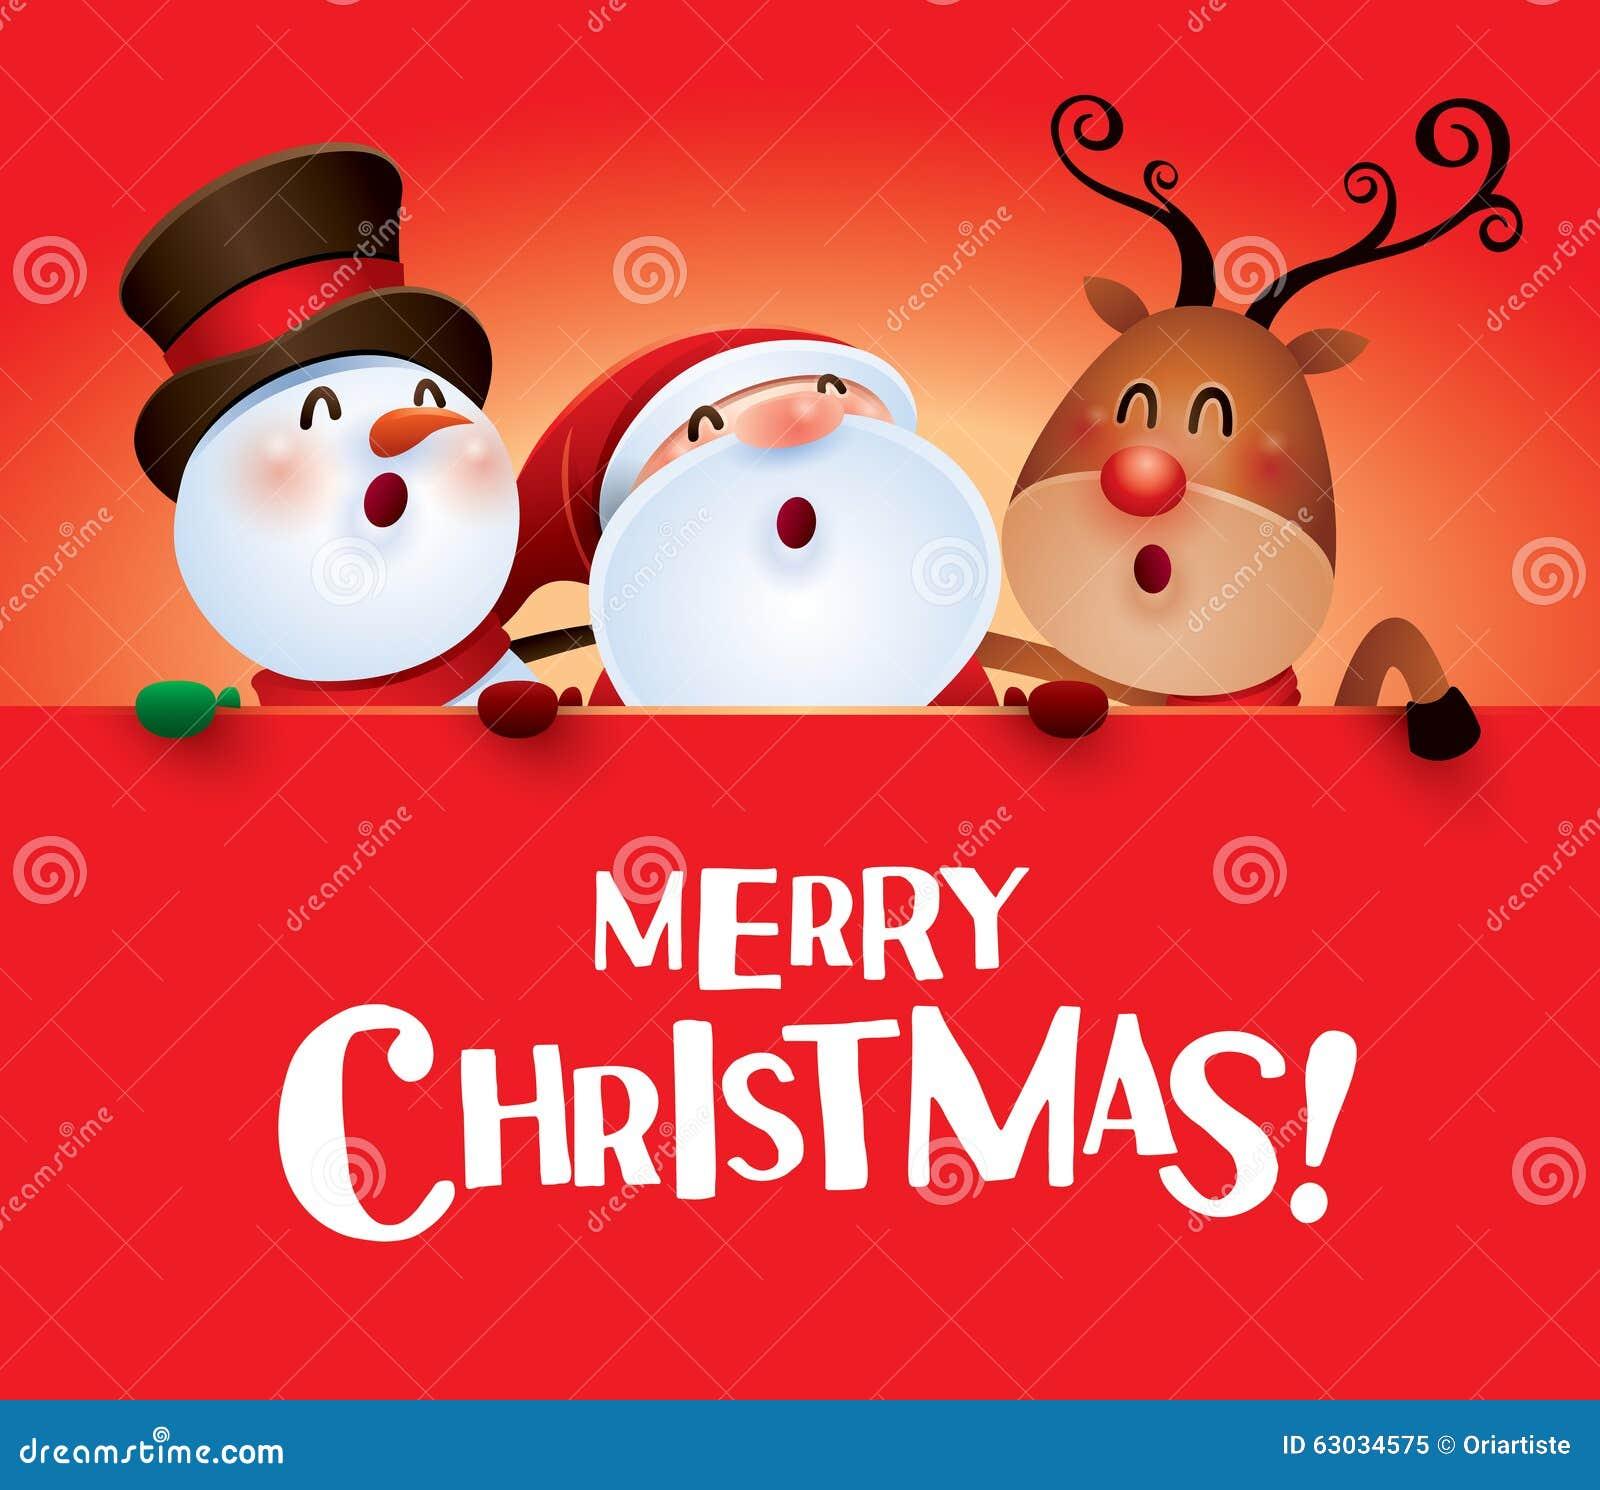 Merry Christmas! Happy Christmas Companions With Big Sign